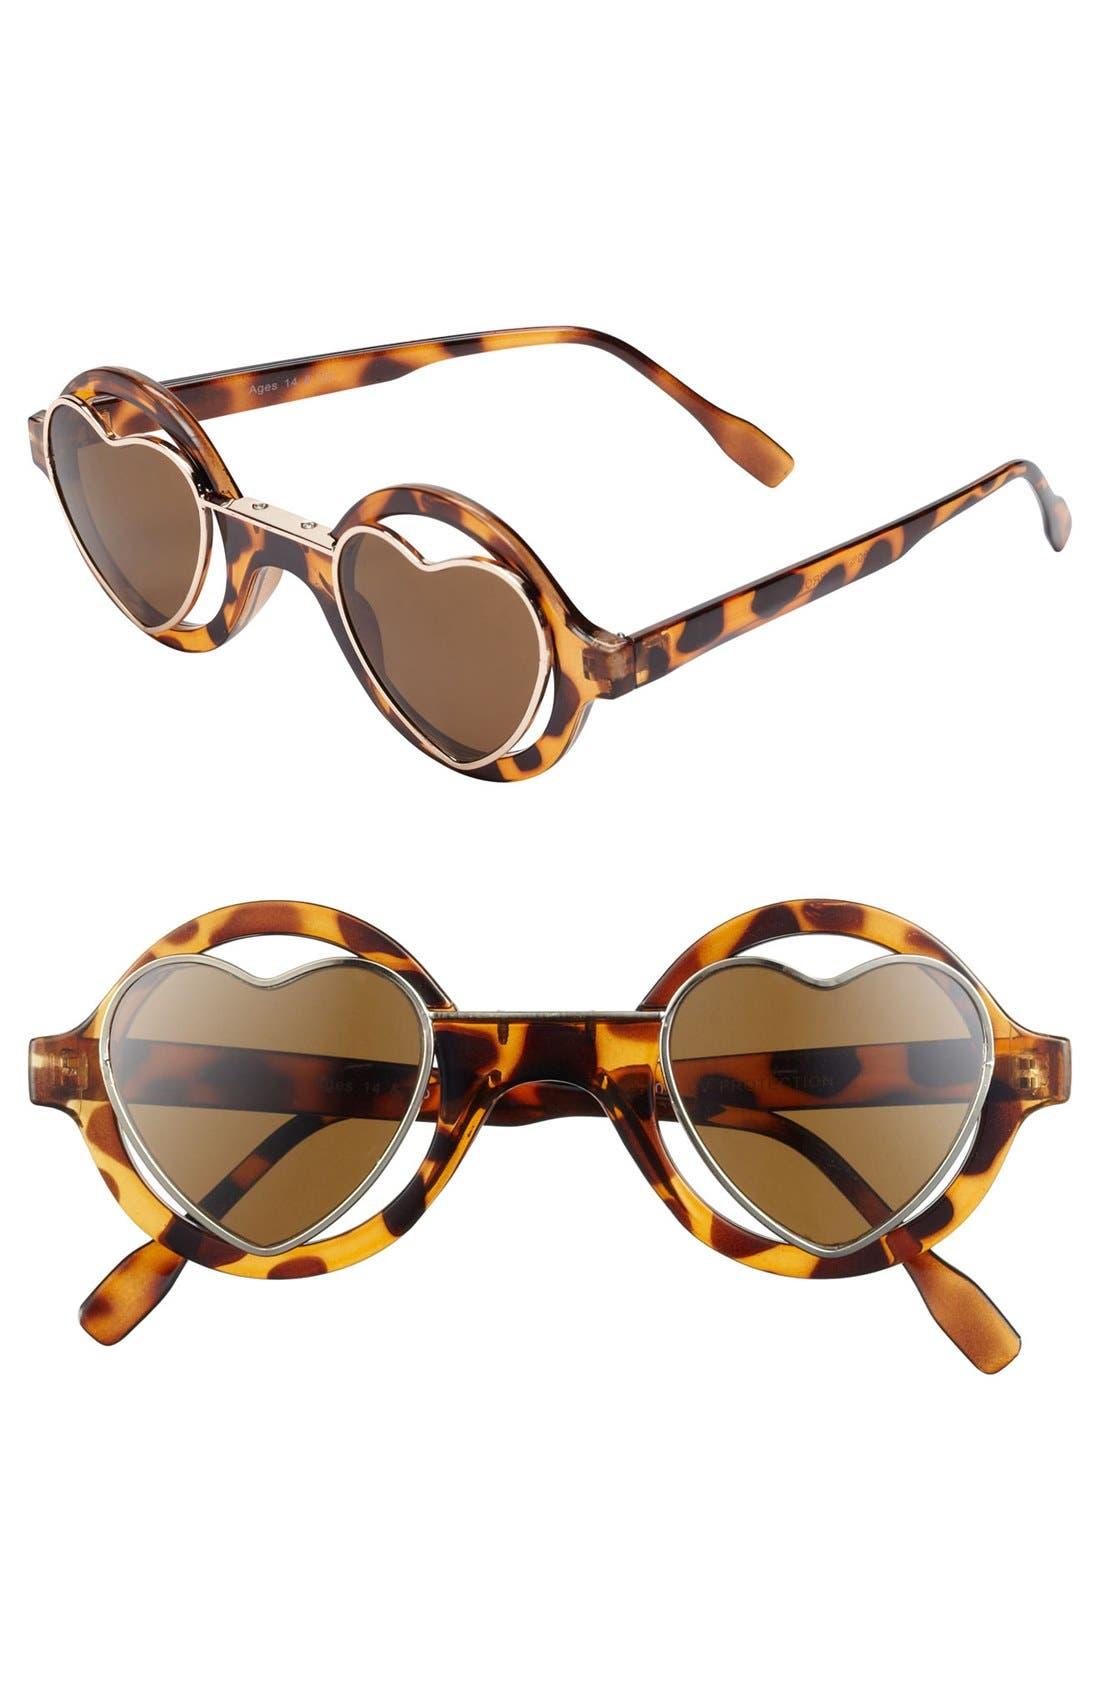 Main Image - FE NY 'Inner Sanctum' Sunglasses